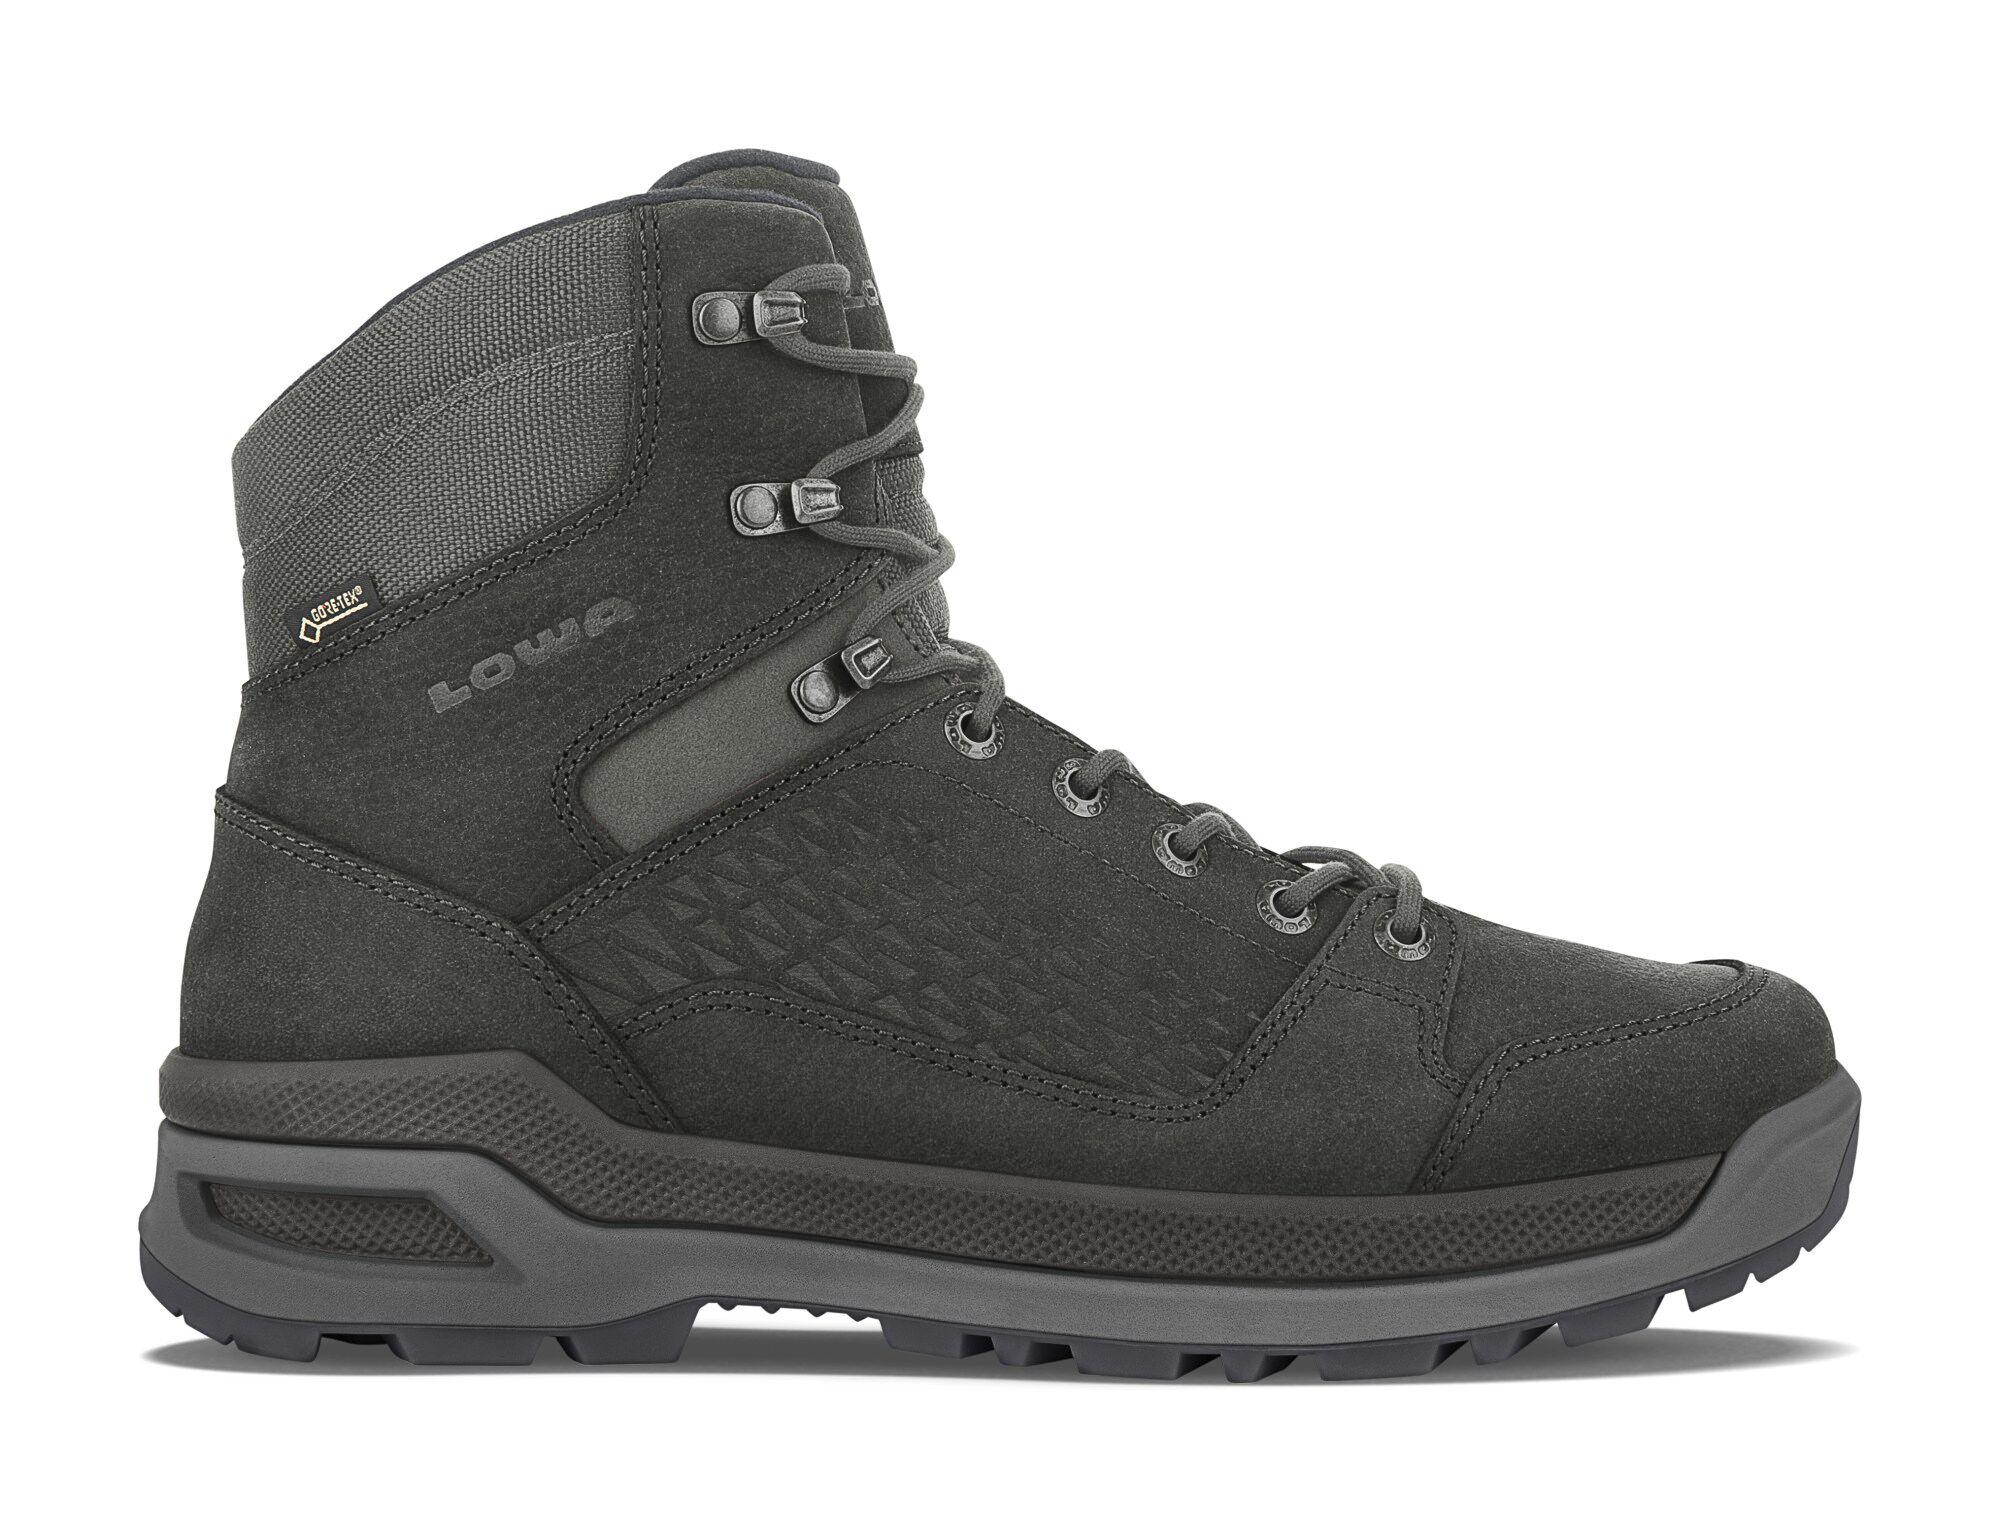 Lowa Locarno Ice GTX Mid kengät